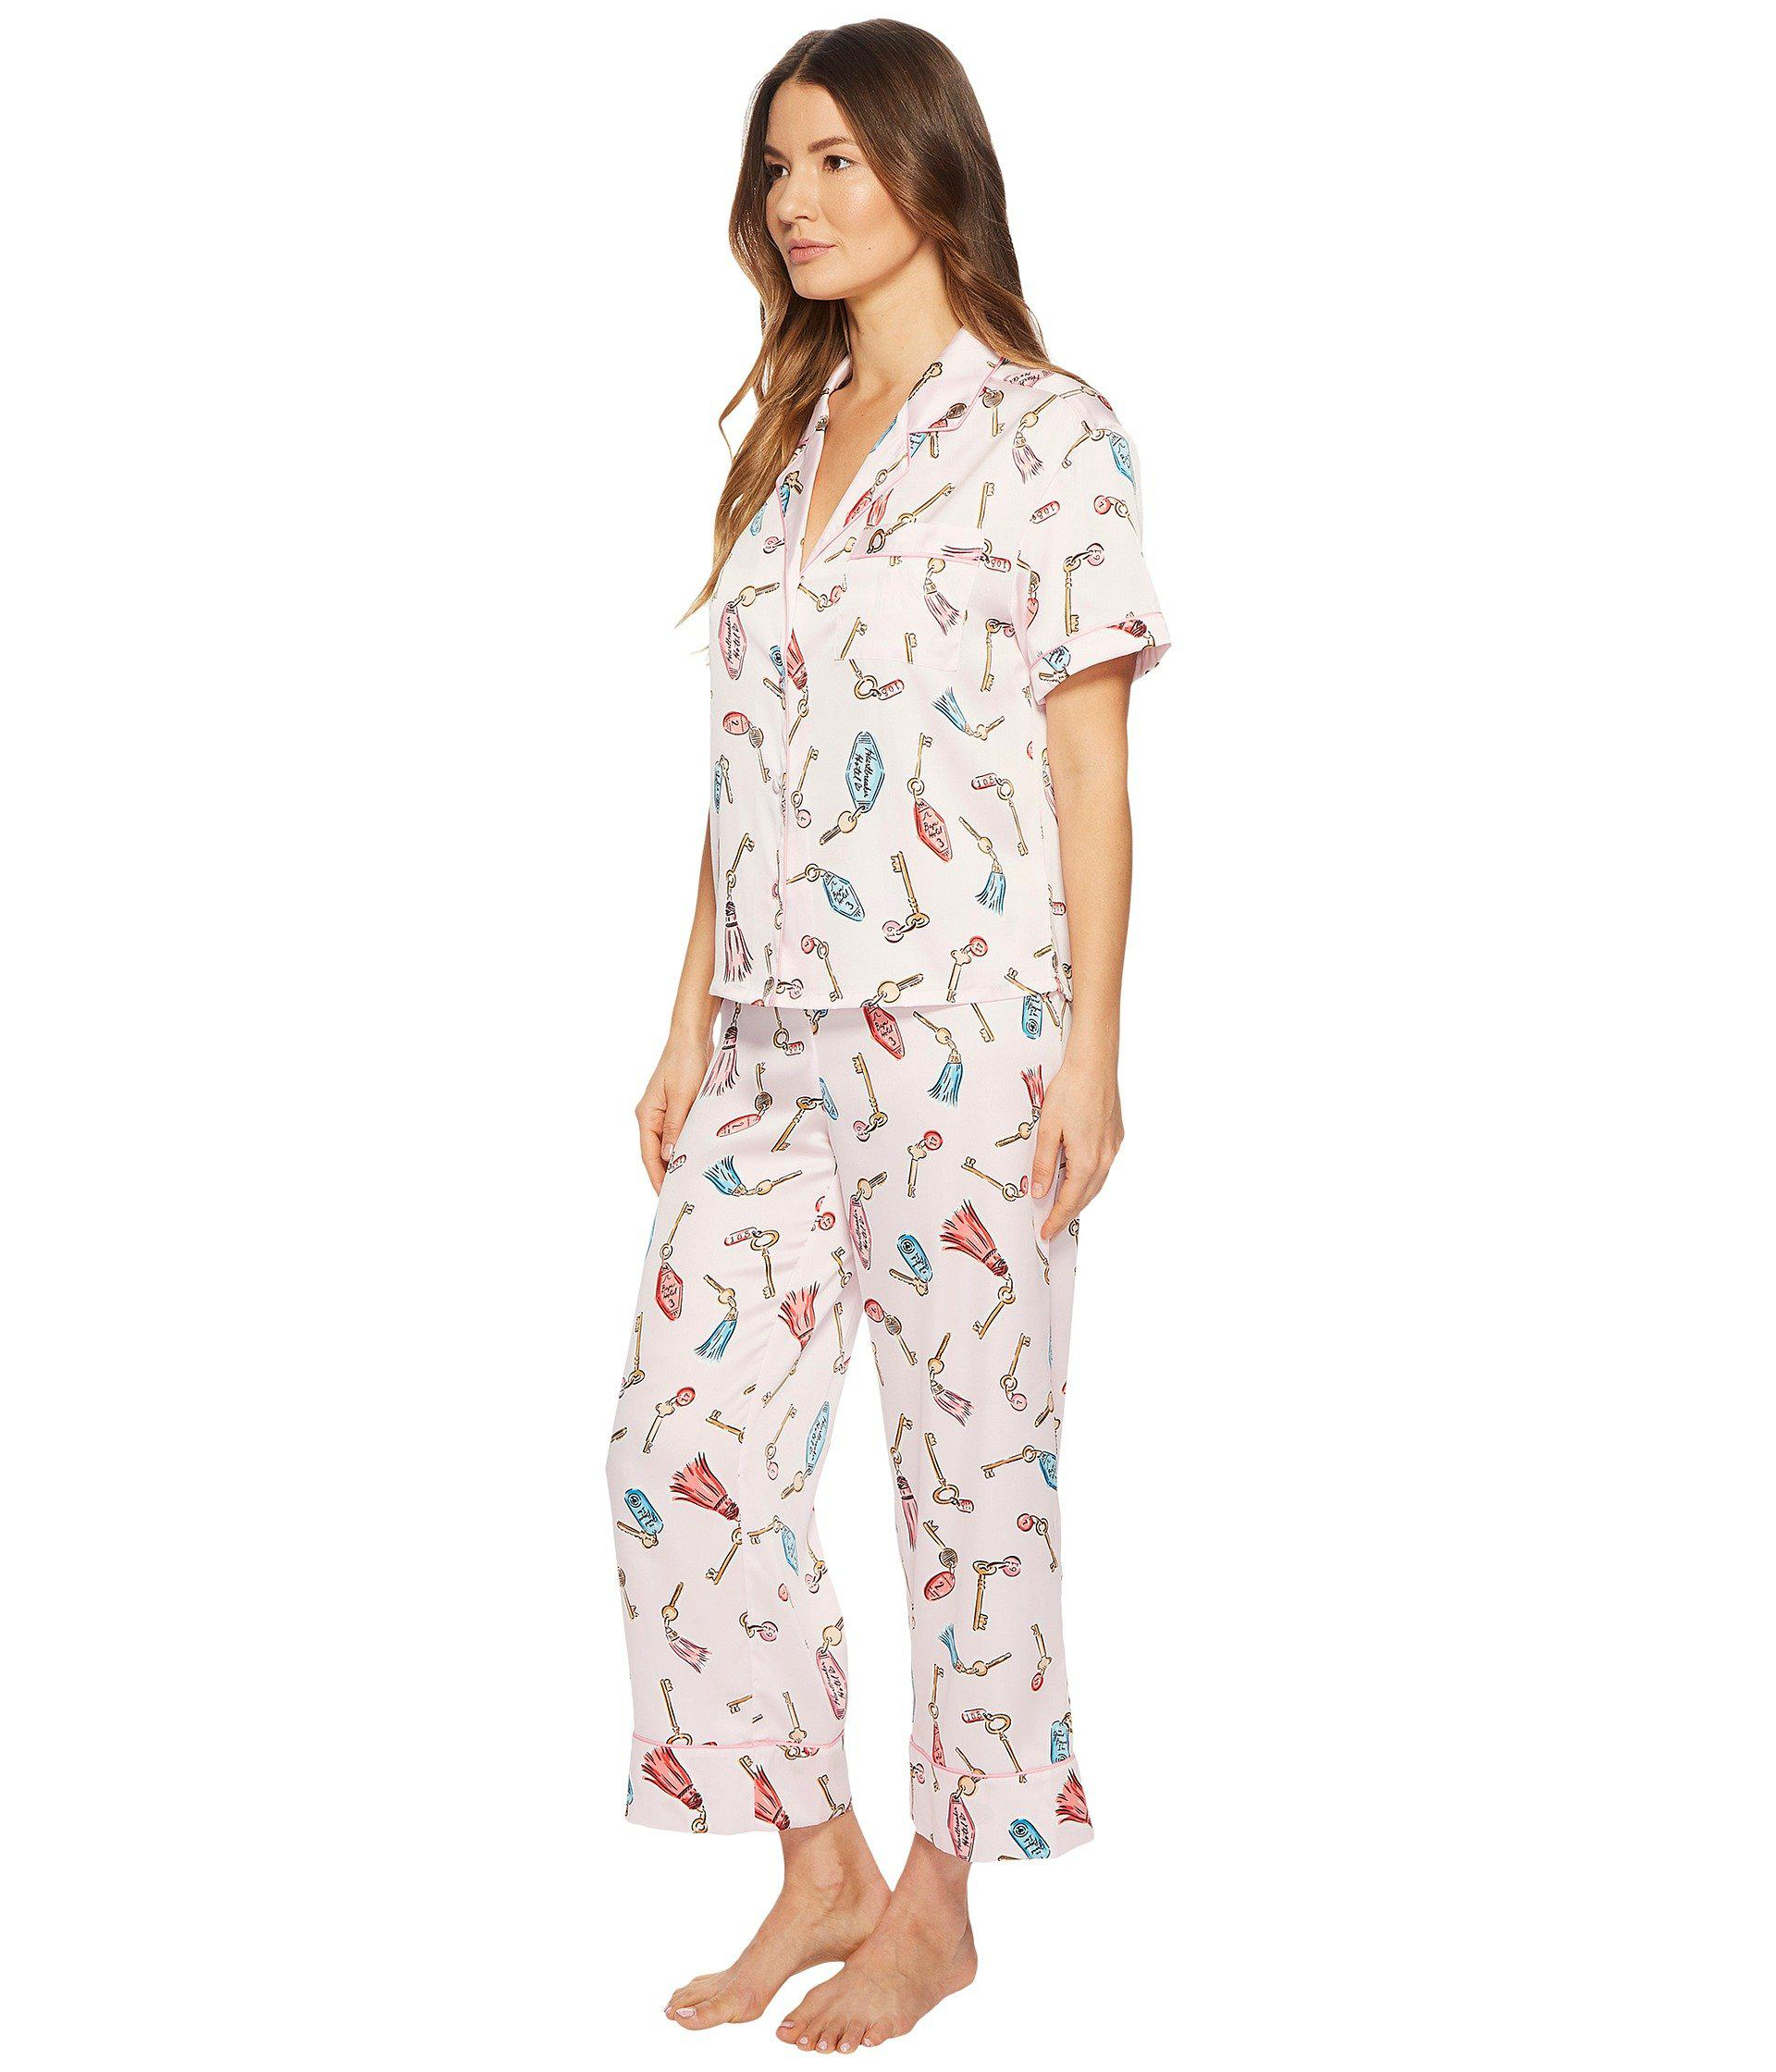 c5a7a45a49f Lyst - Kate Spade Hotel Keys Cropped Pajama Set